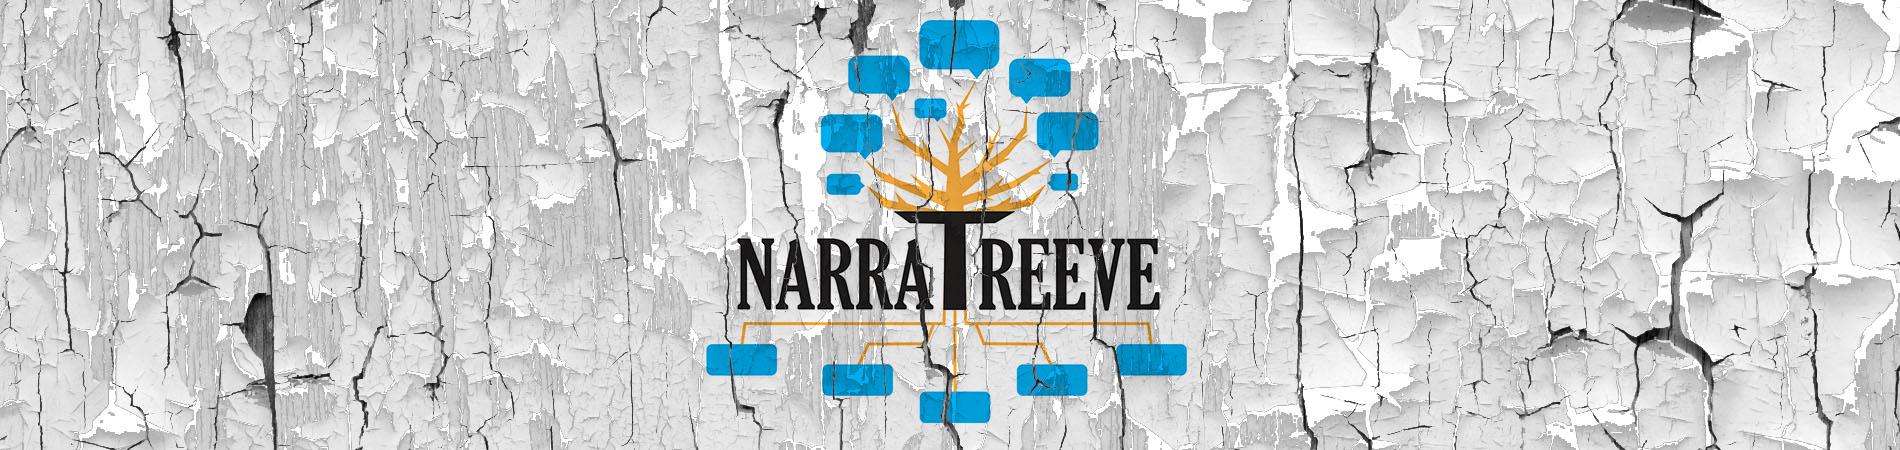 NarraTreeve